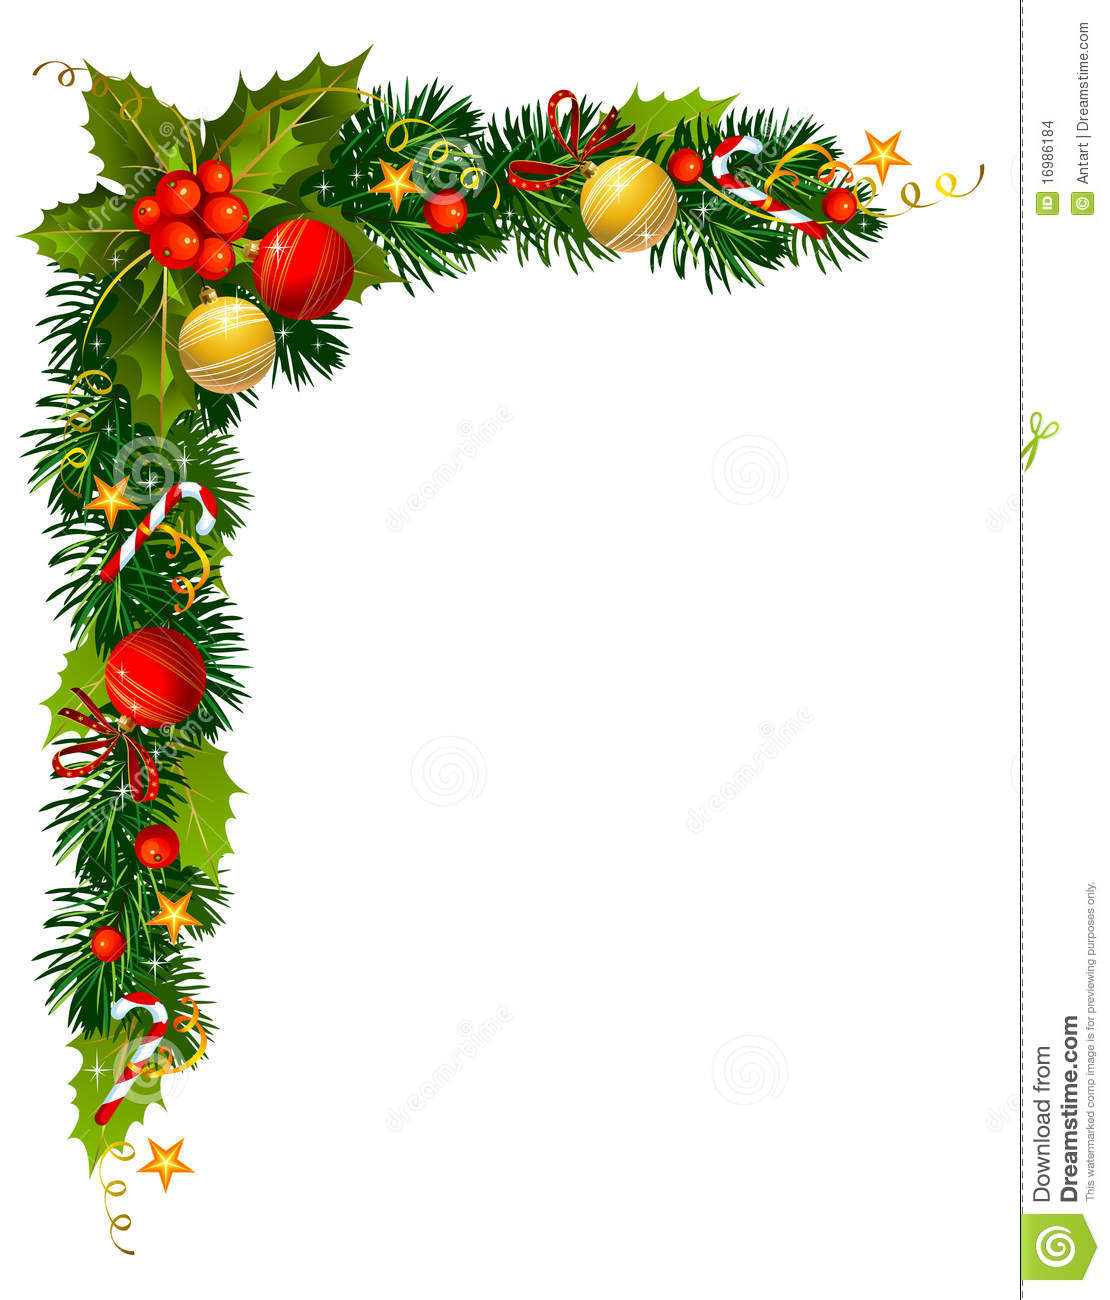 1110x1300 Christmas Holly Border Clip Art Christmas Holly Border Page